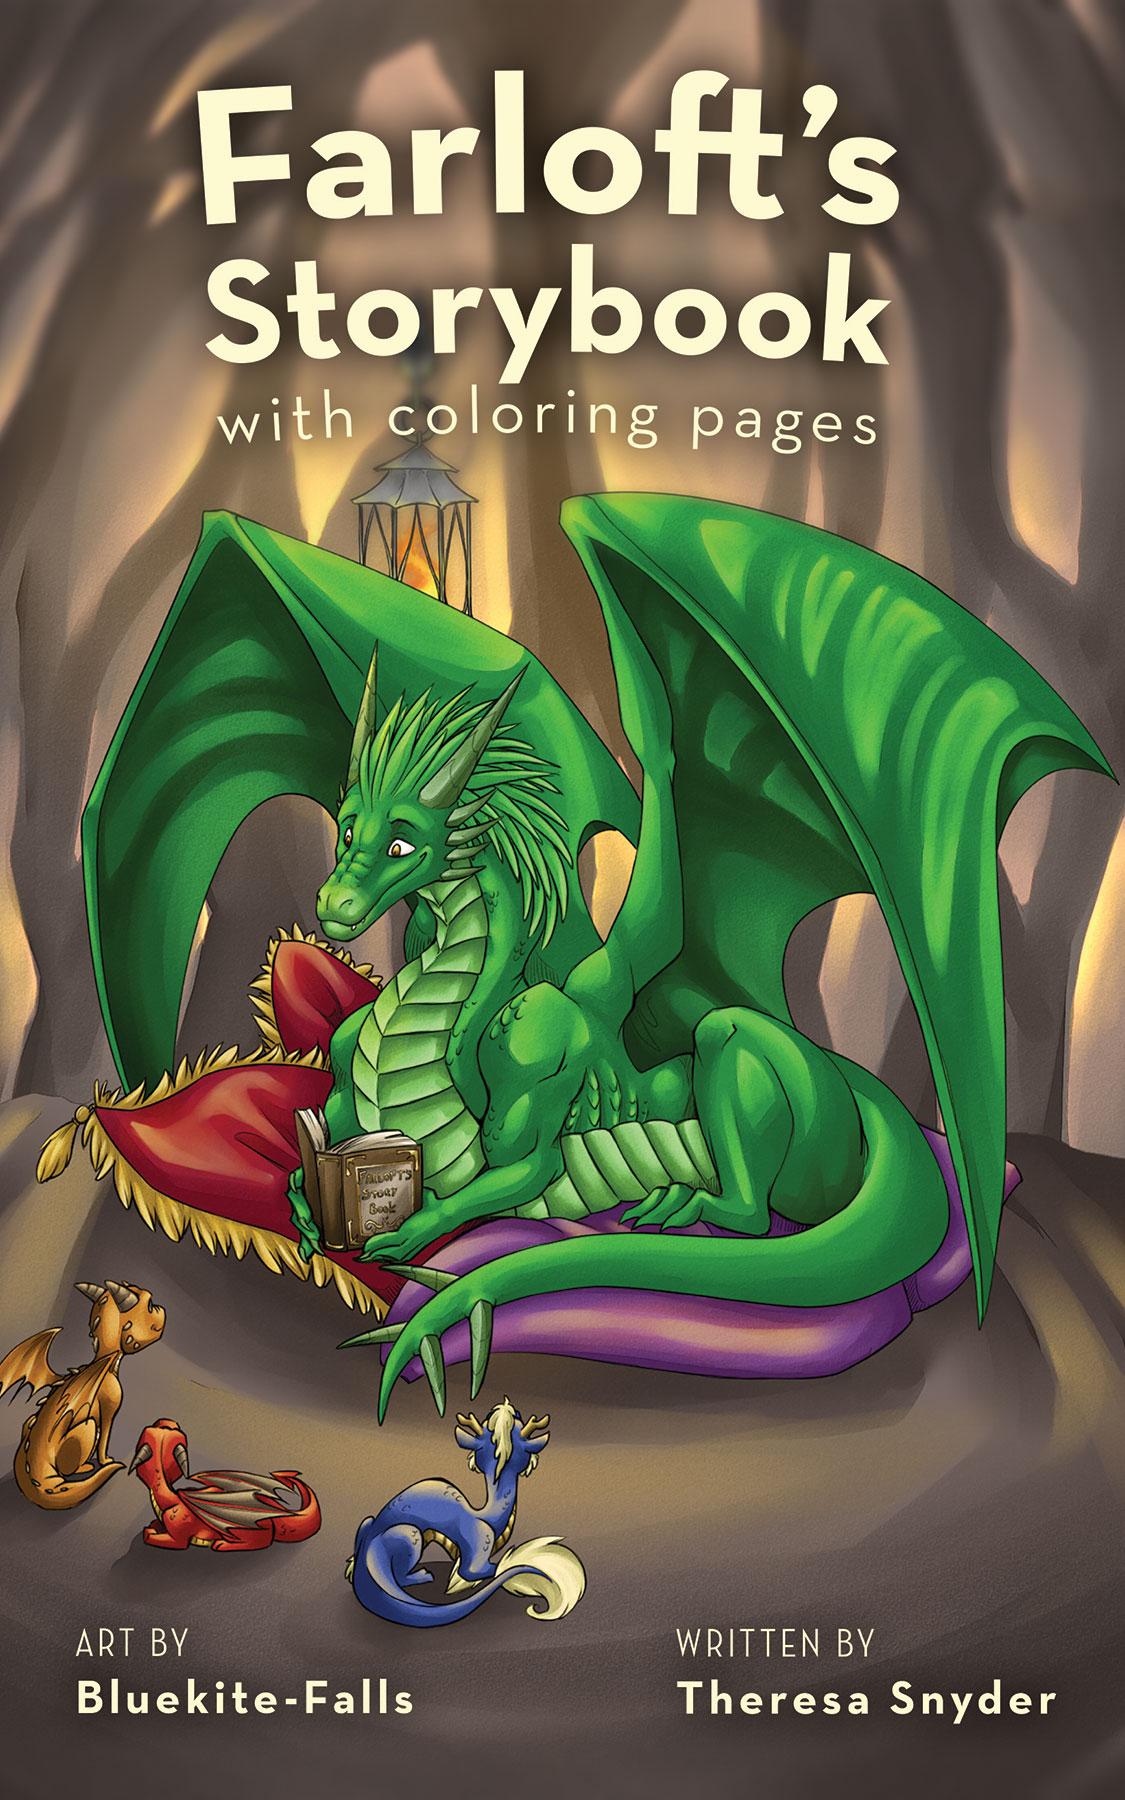 Farloft's Storybook